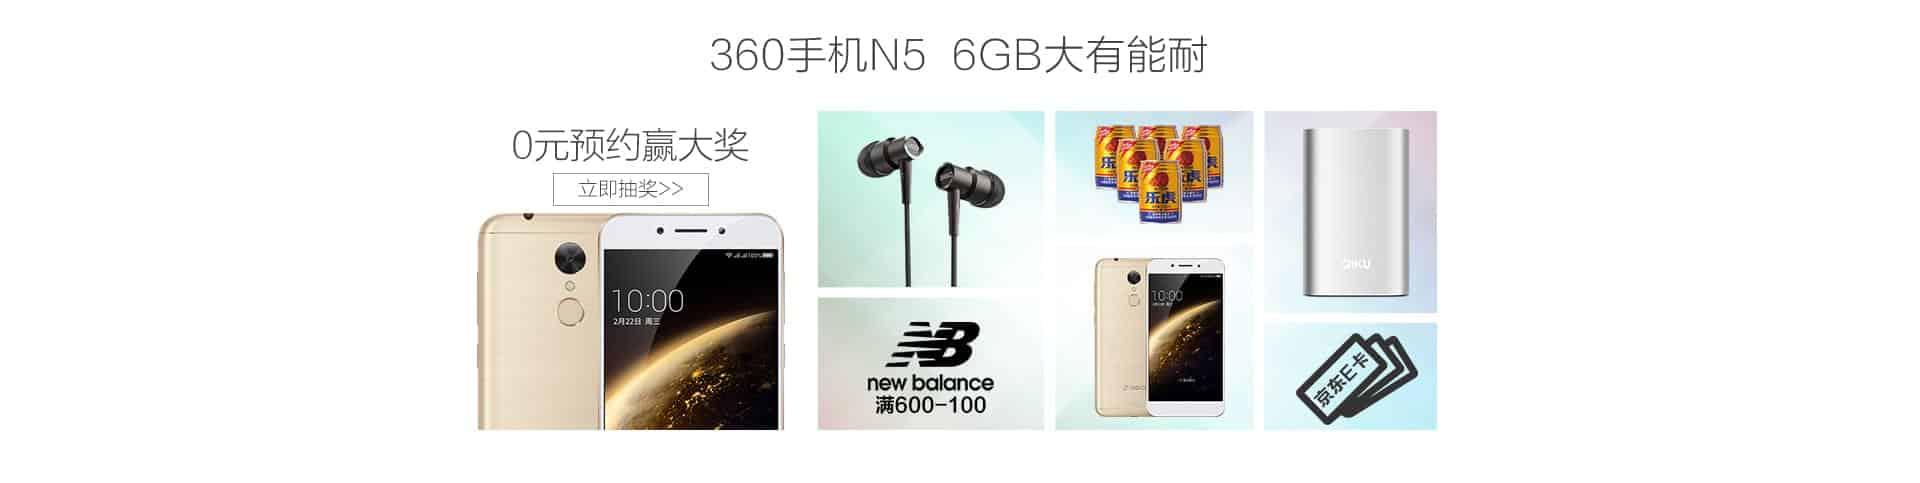 Qihoo 360 N5 1